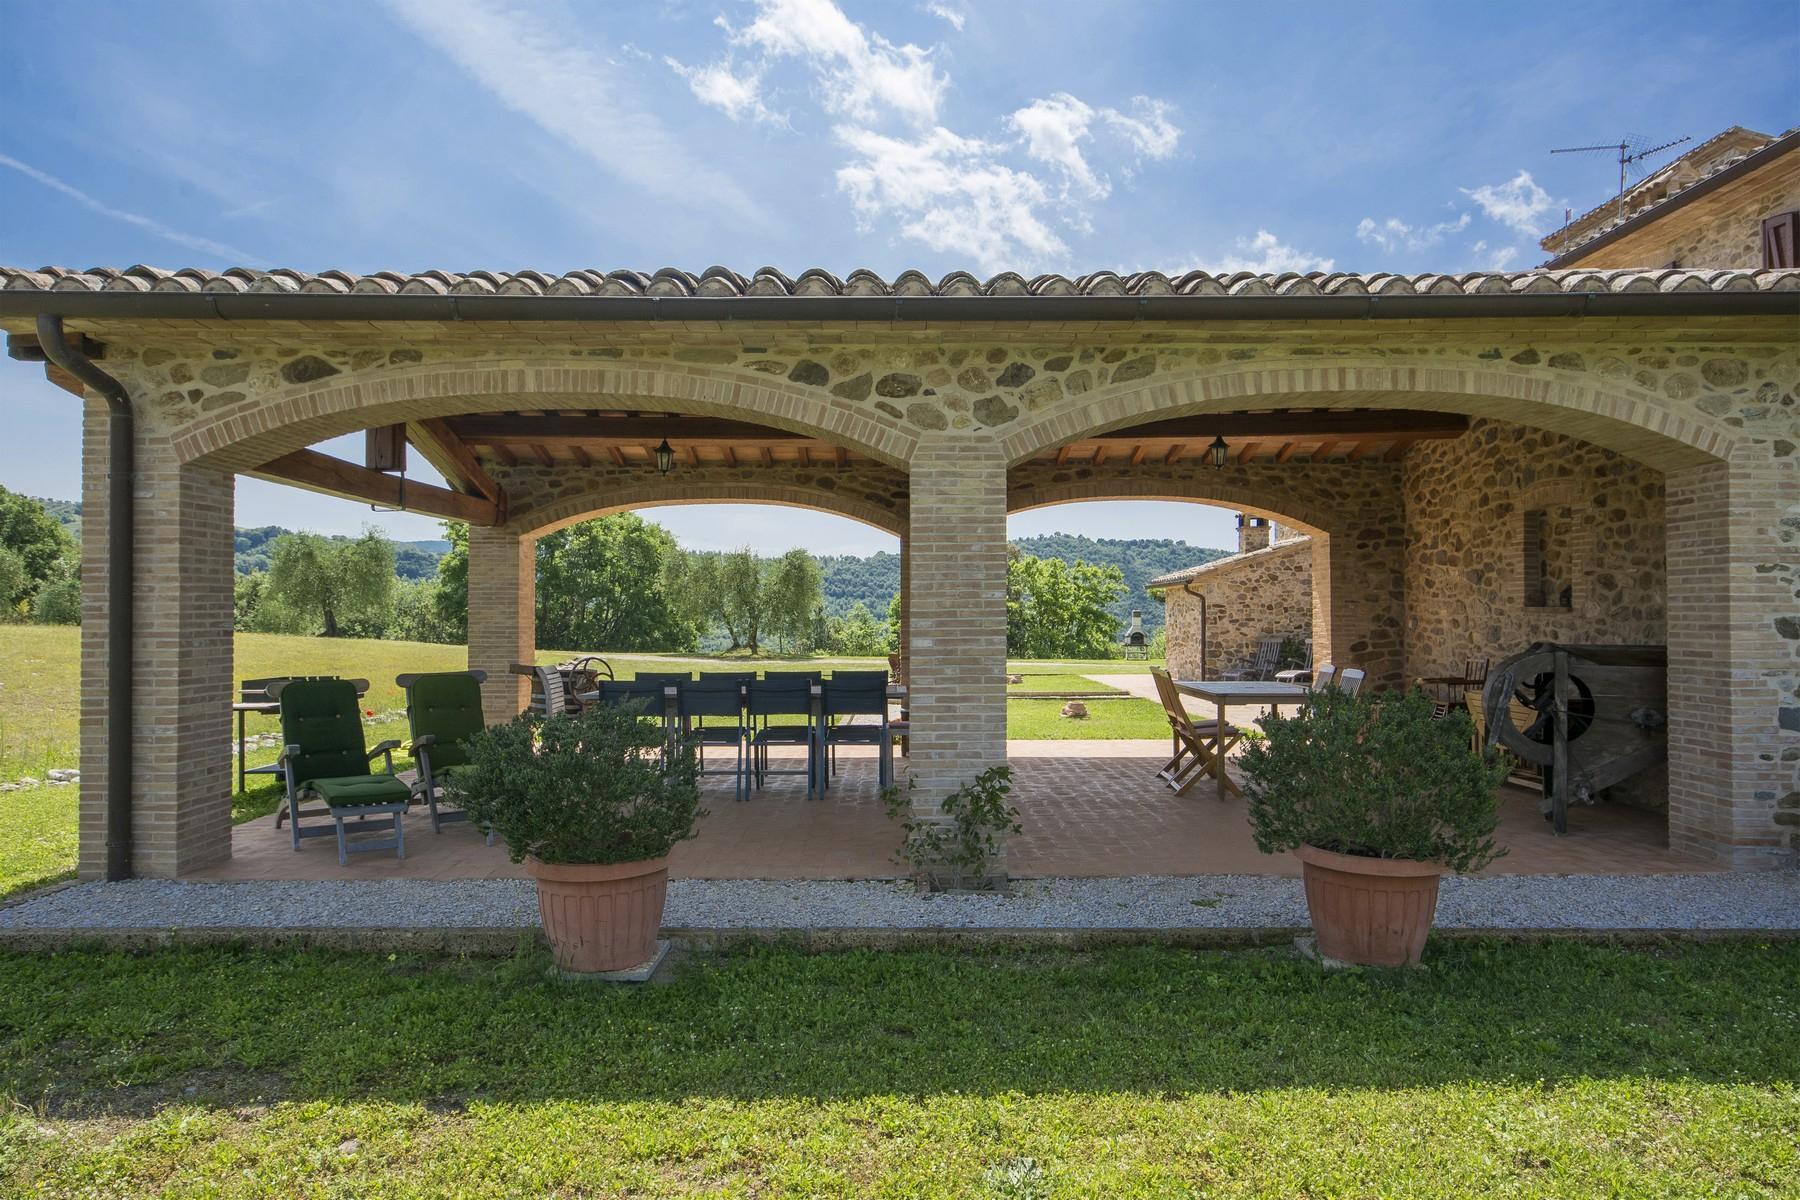 Eccezionale proprietà tra Toscana e Umbria - 6